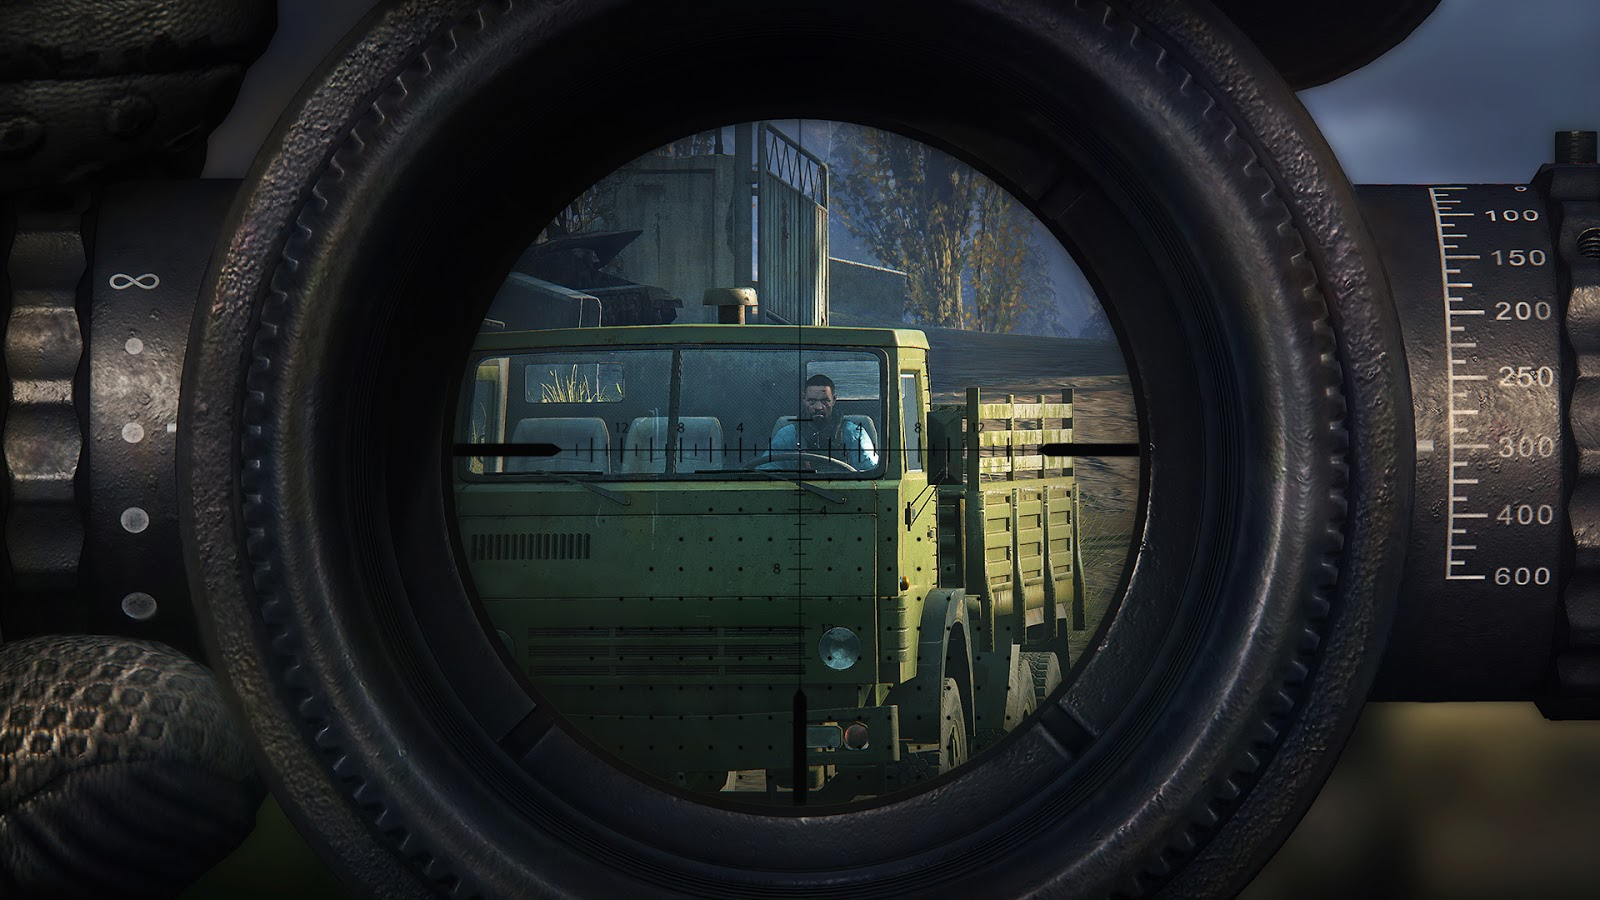 Sniper Ghost Warrior 3 ESPAÑOL PC (CPY) + Update v1.08 (PLAZA) + REPACK 10 DVD5 (JPW) 1